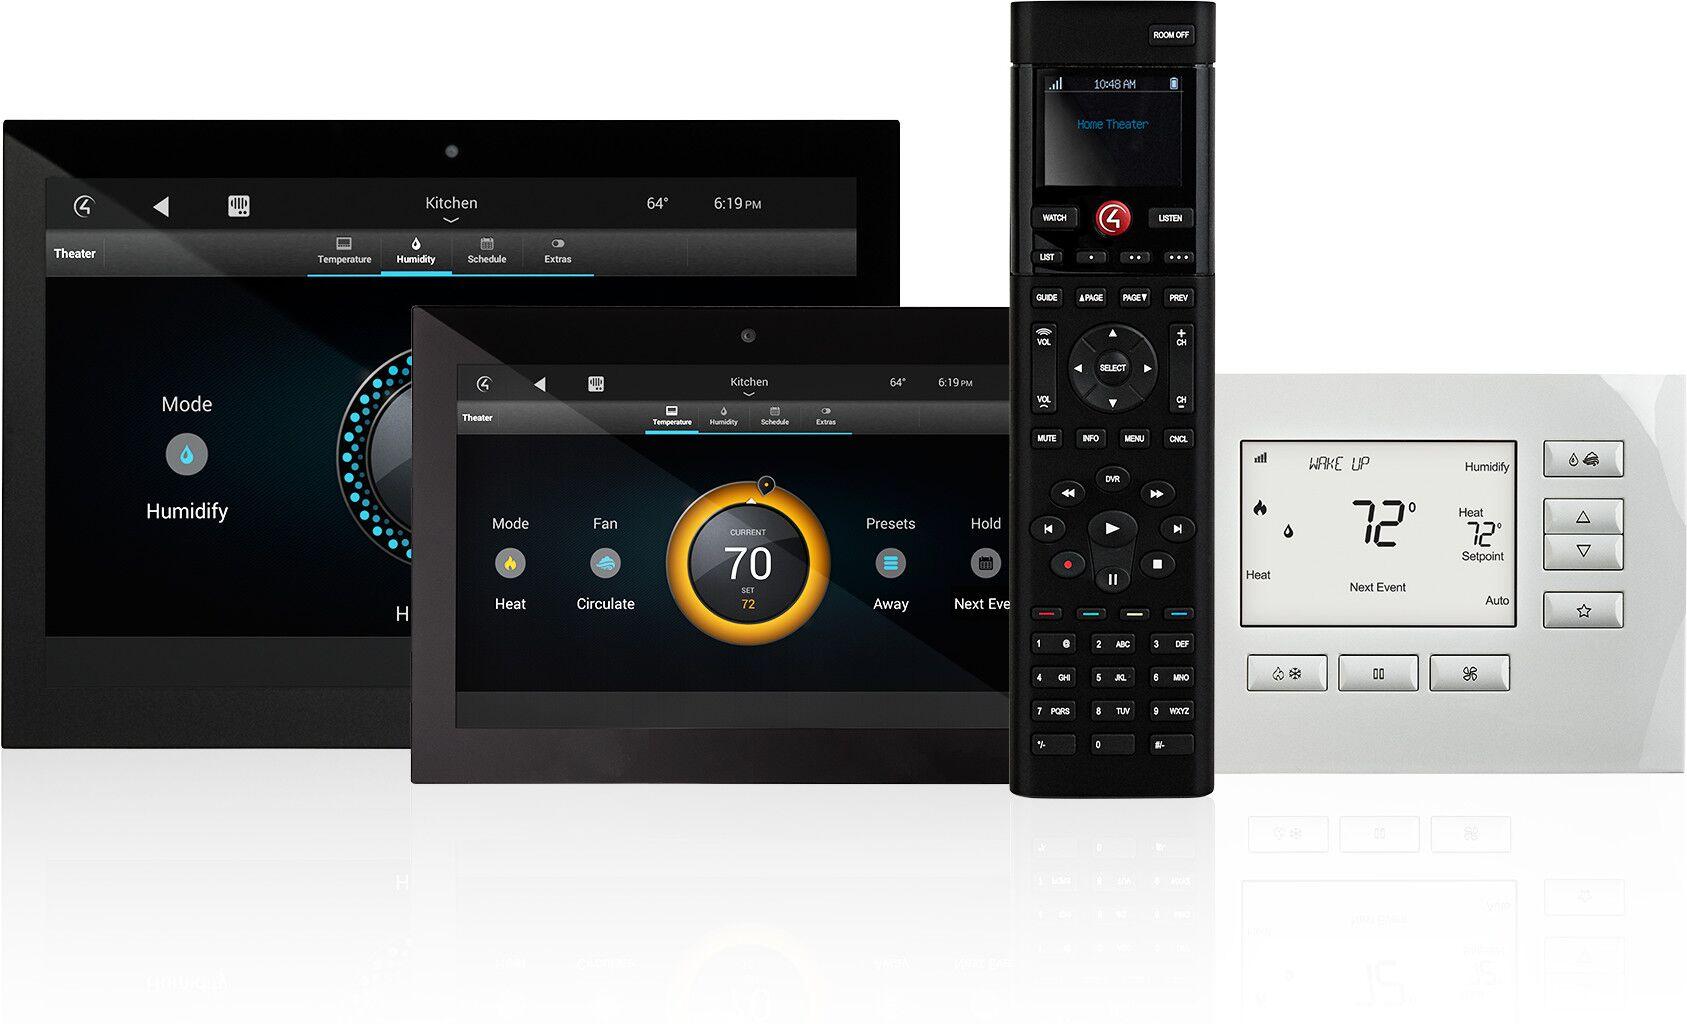 TouchScreens_Thermostat_SR260_WhiteBG.jpeg